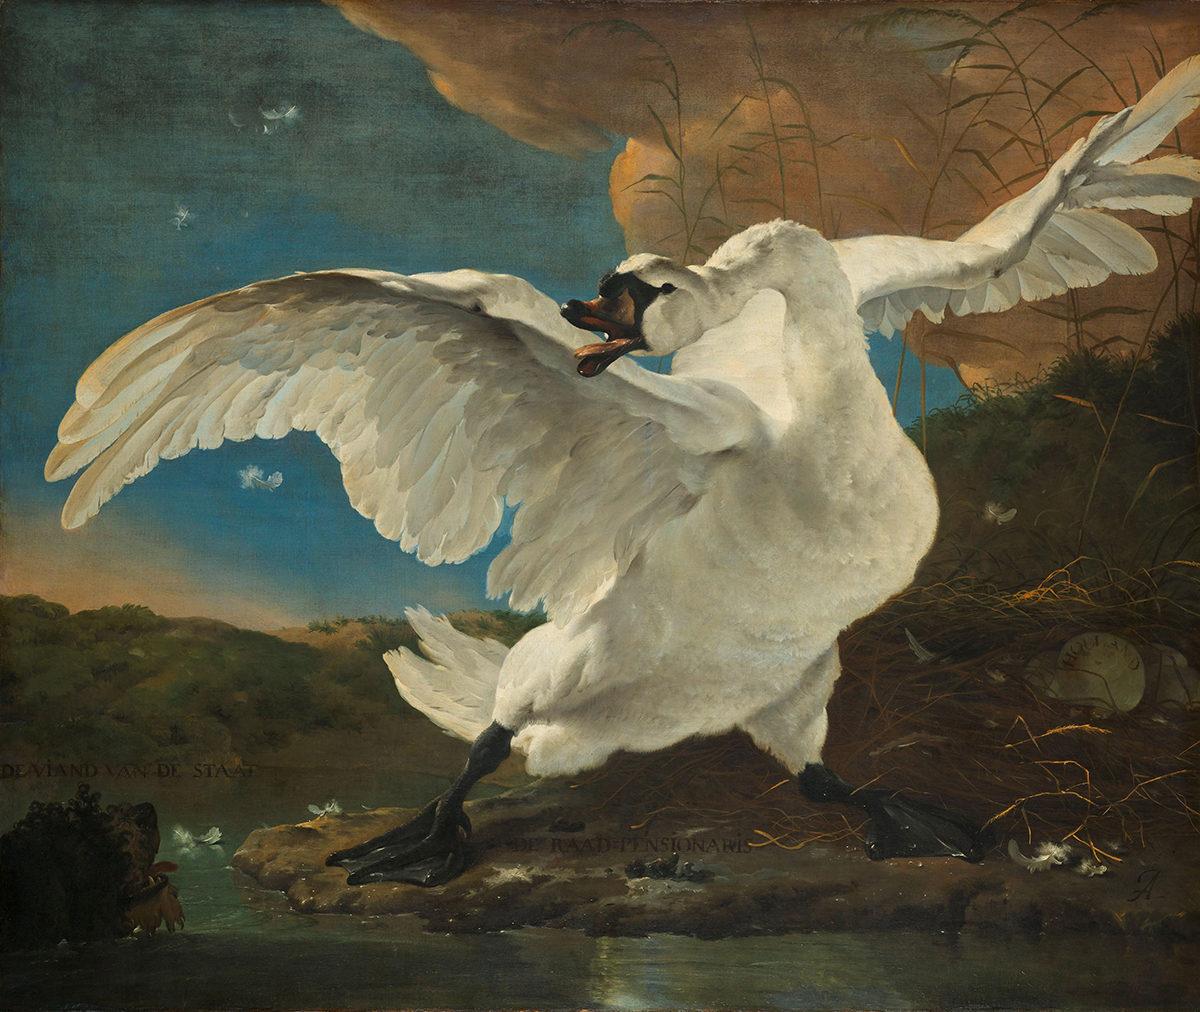 Jan Asselijn, The Threatened Swan, c. 1650. Amsterdam, Rijksmuseum.